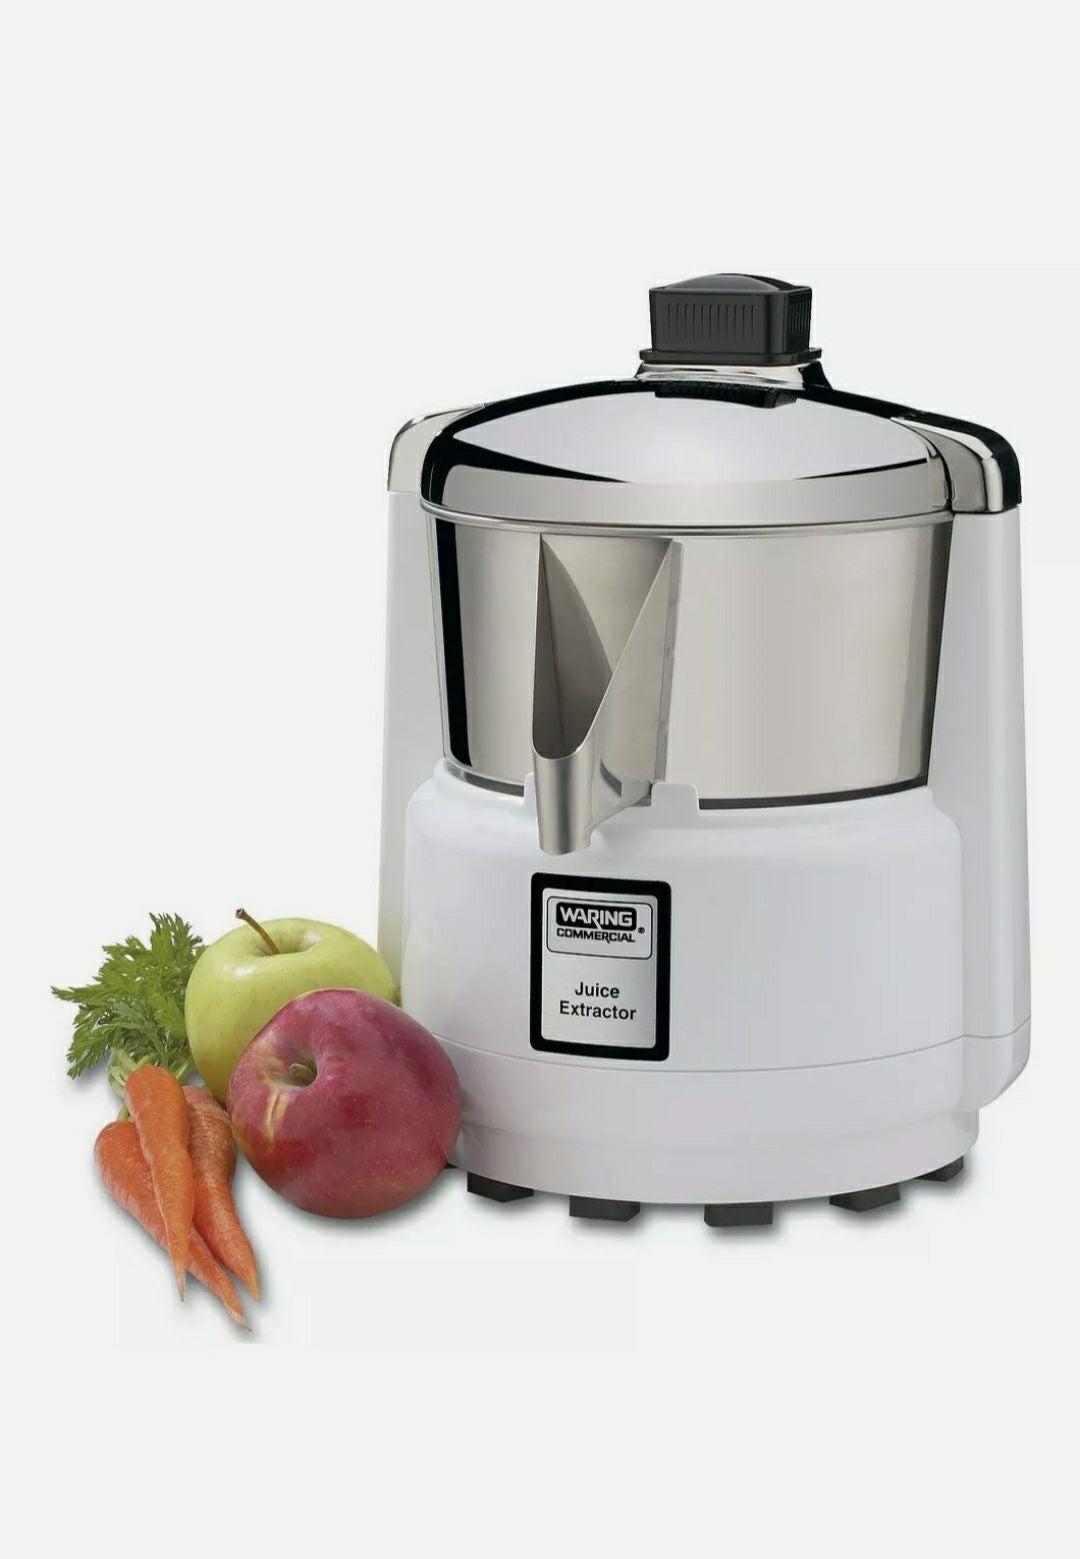 Waring 6001C Commercial Juice Extractor